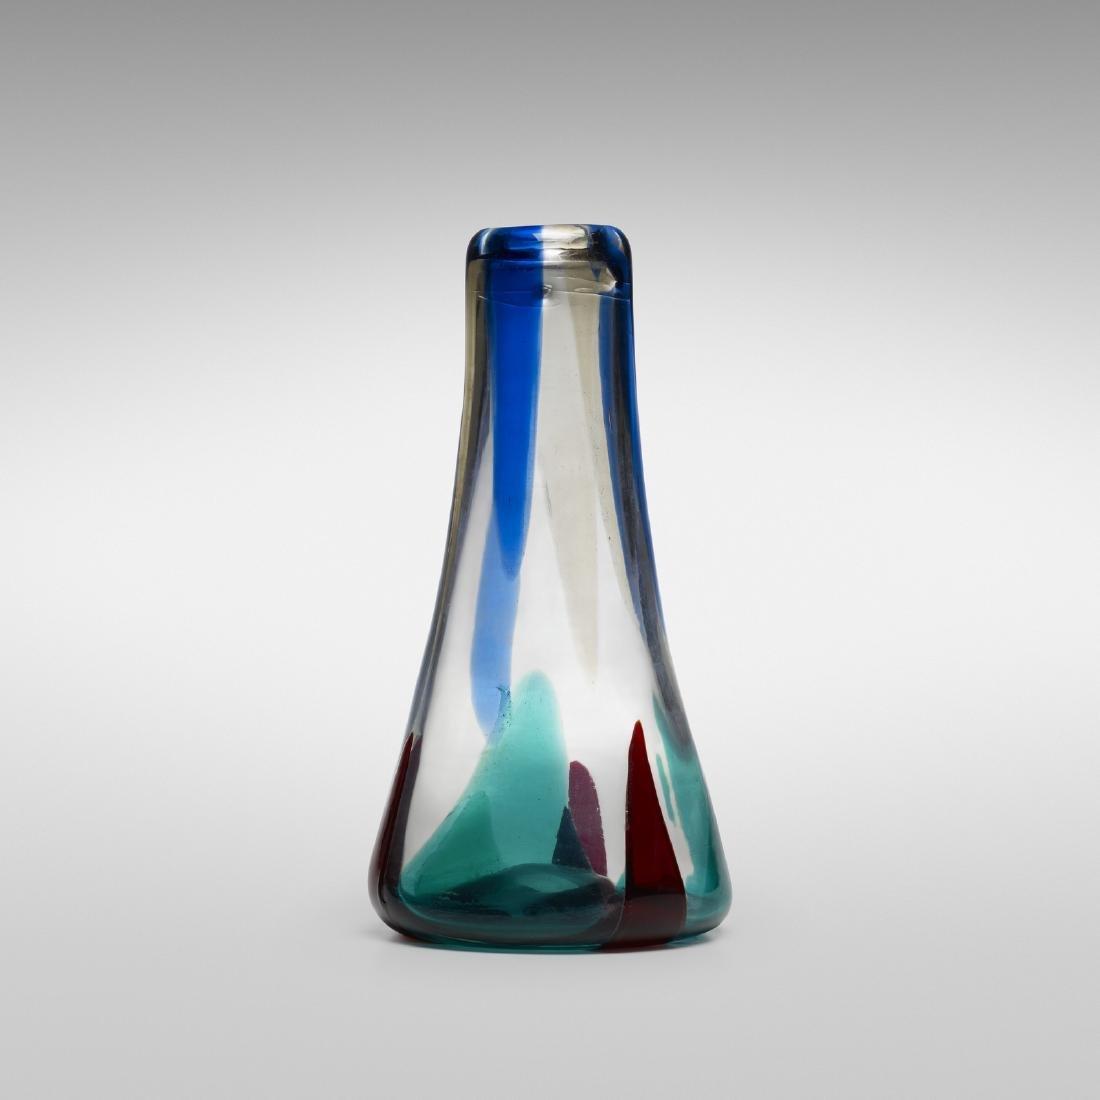 Fulvio Bianconi, Rare Pezzame vase, model 4394